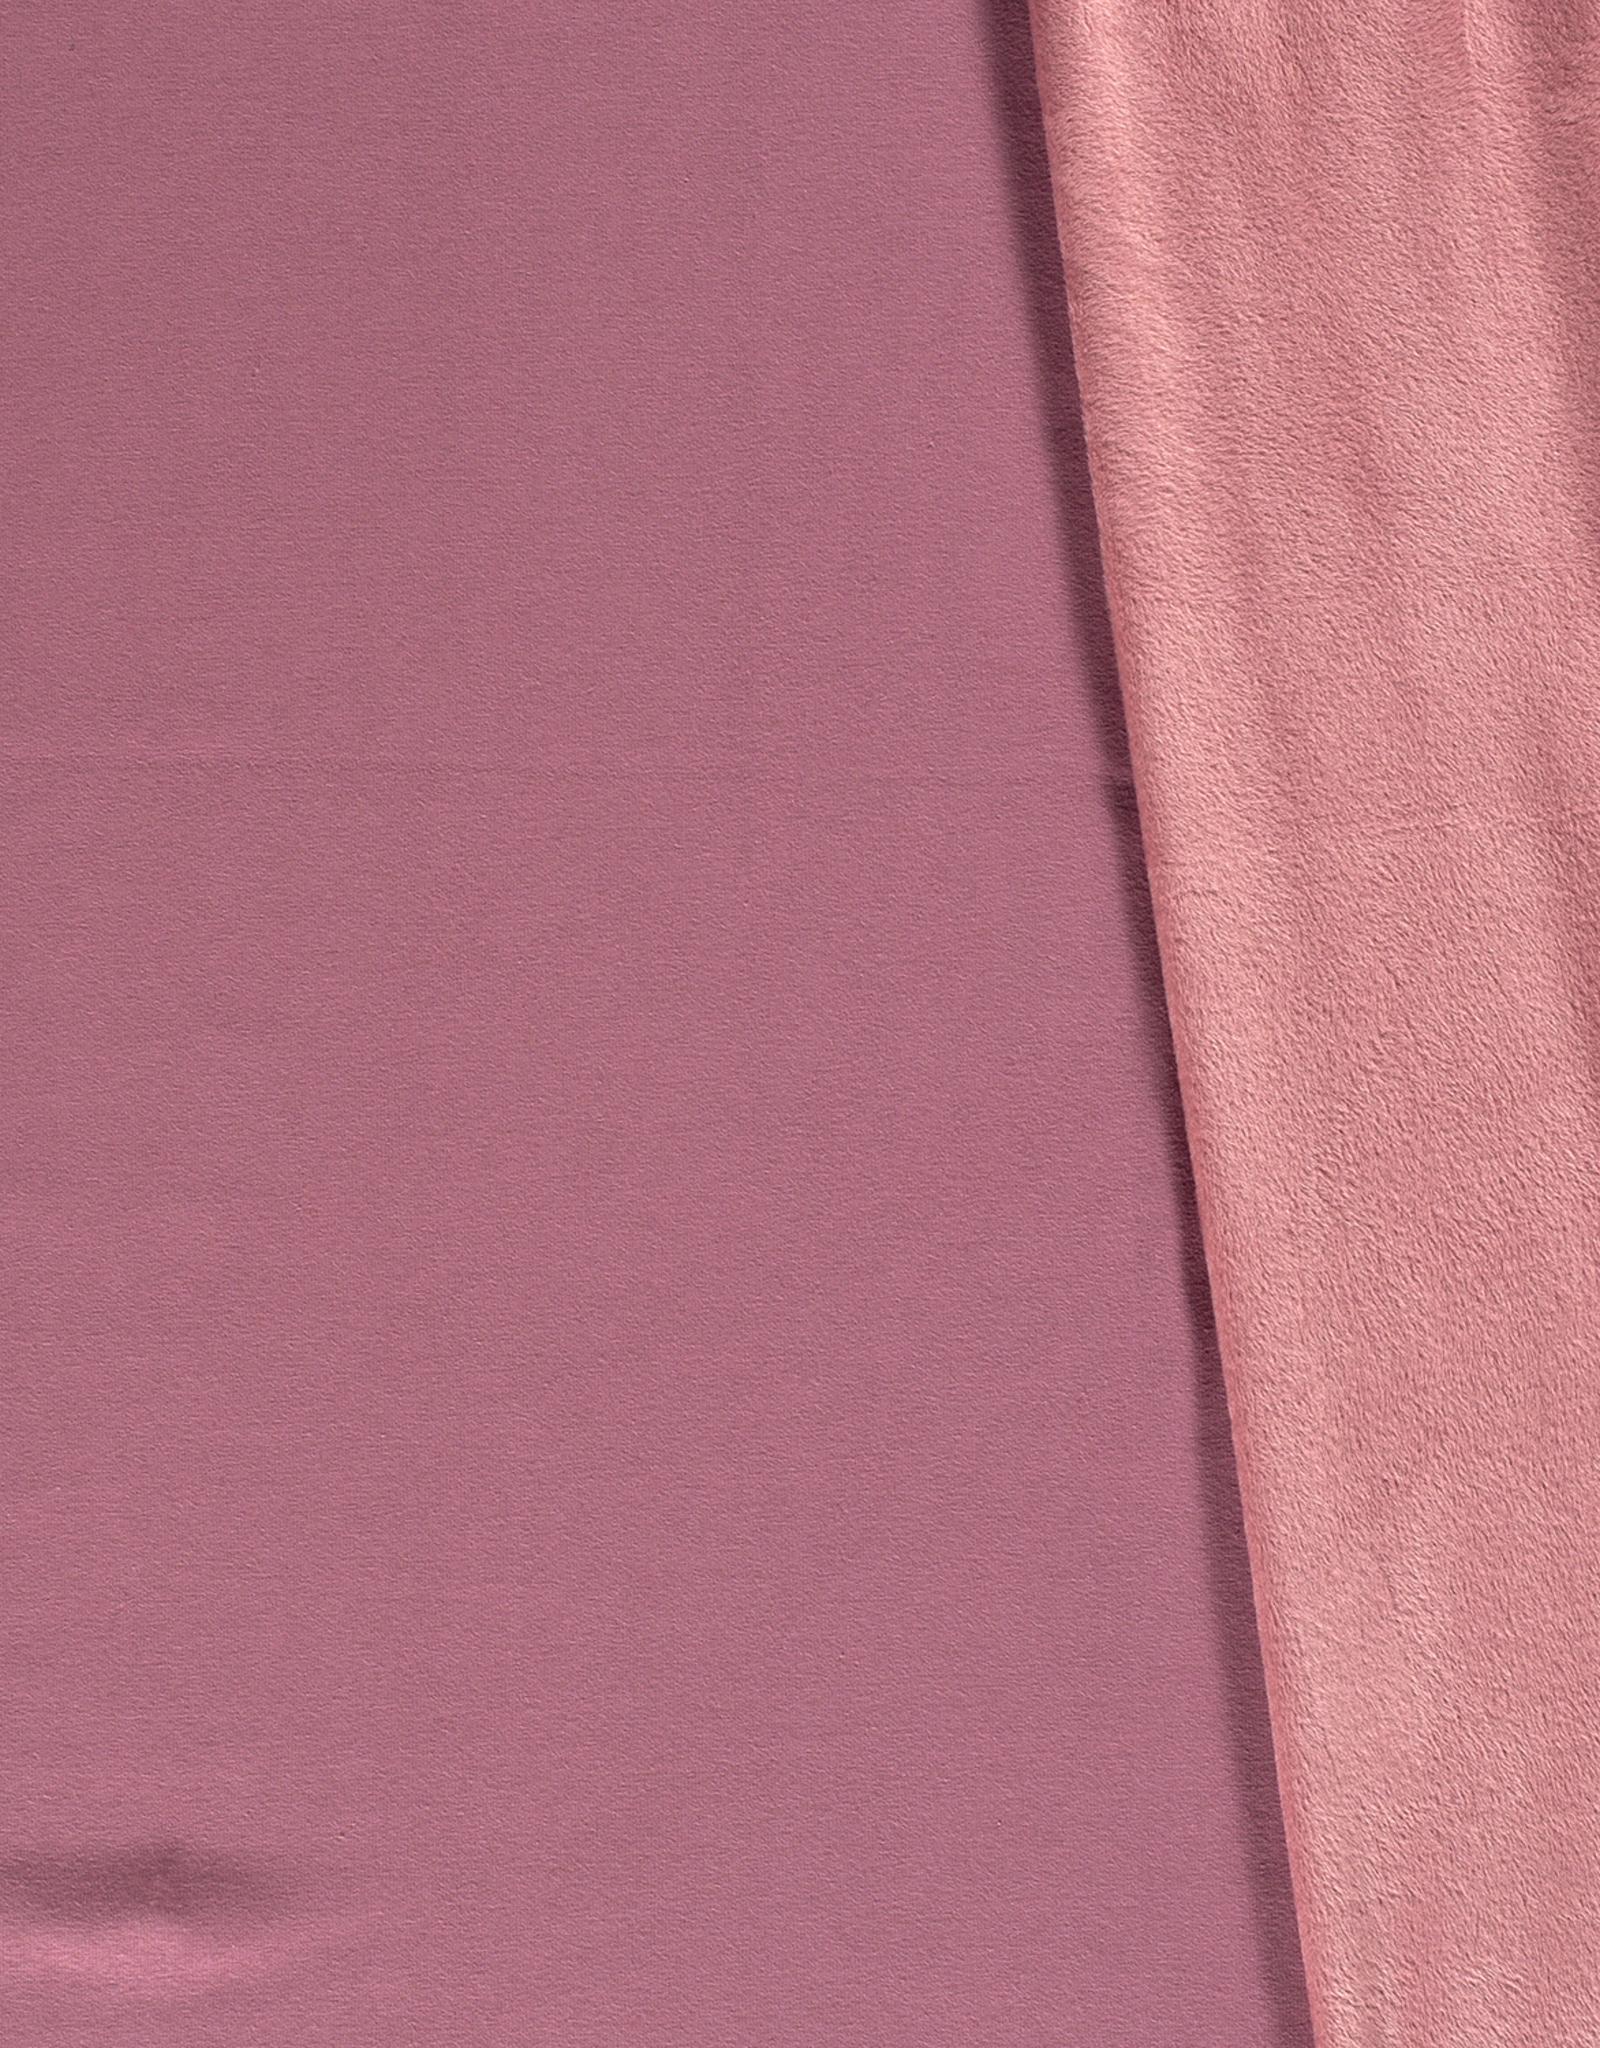 Alpenfleece roze